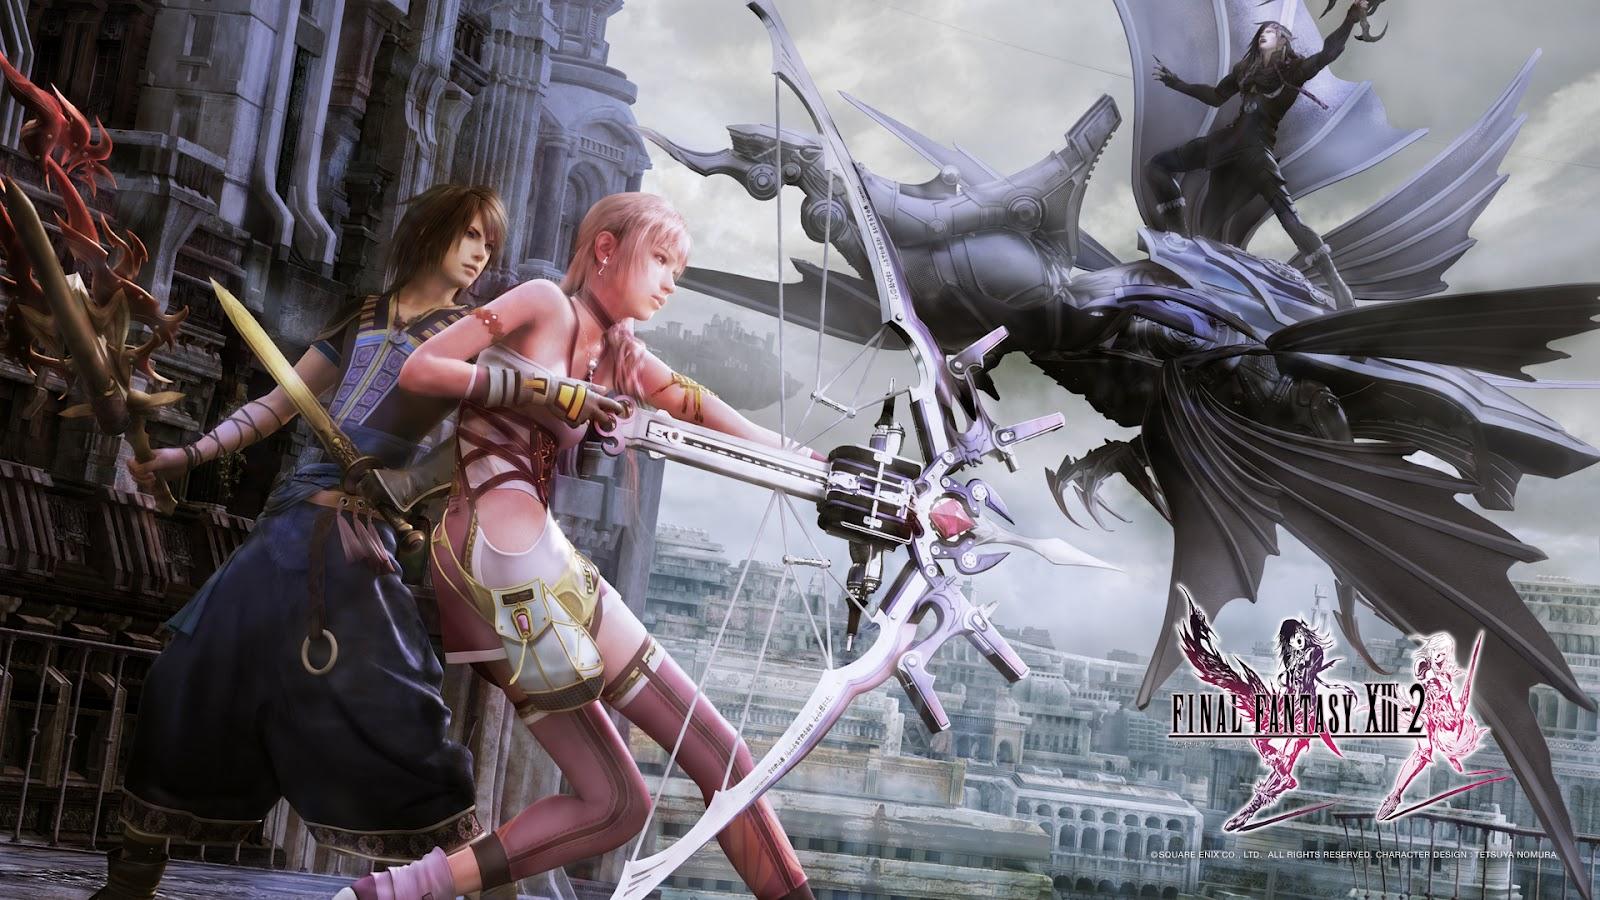 http://2.bp.blogspot.com/-a22wNiHHcq8/UBTu4WqnG7I/AAAAAAAAESE/74HKfkUZUe4/s1600/Final+Fantasy13-2+wallpapers+9.jpg